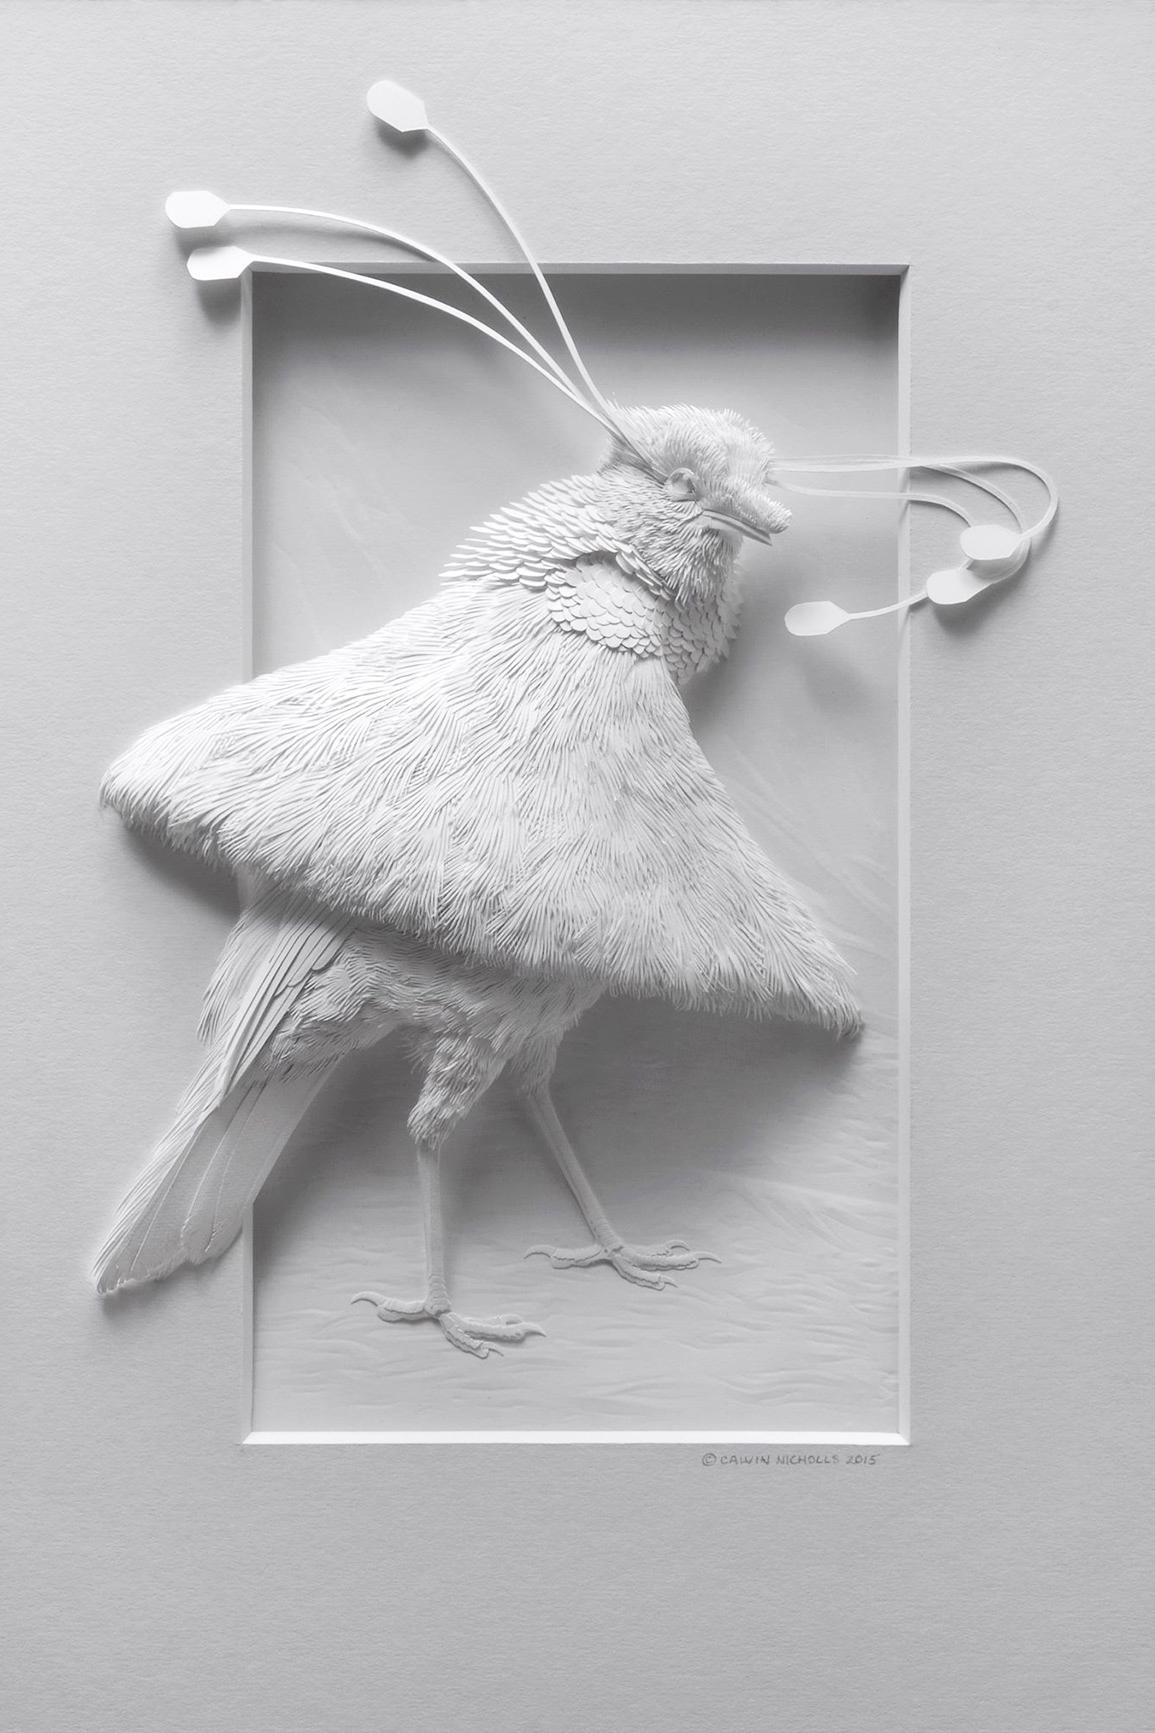 Calvin Nicholls Paper Art 2